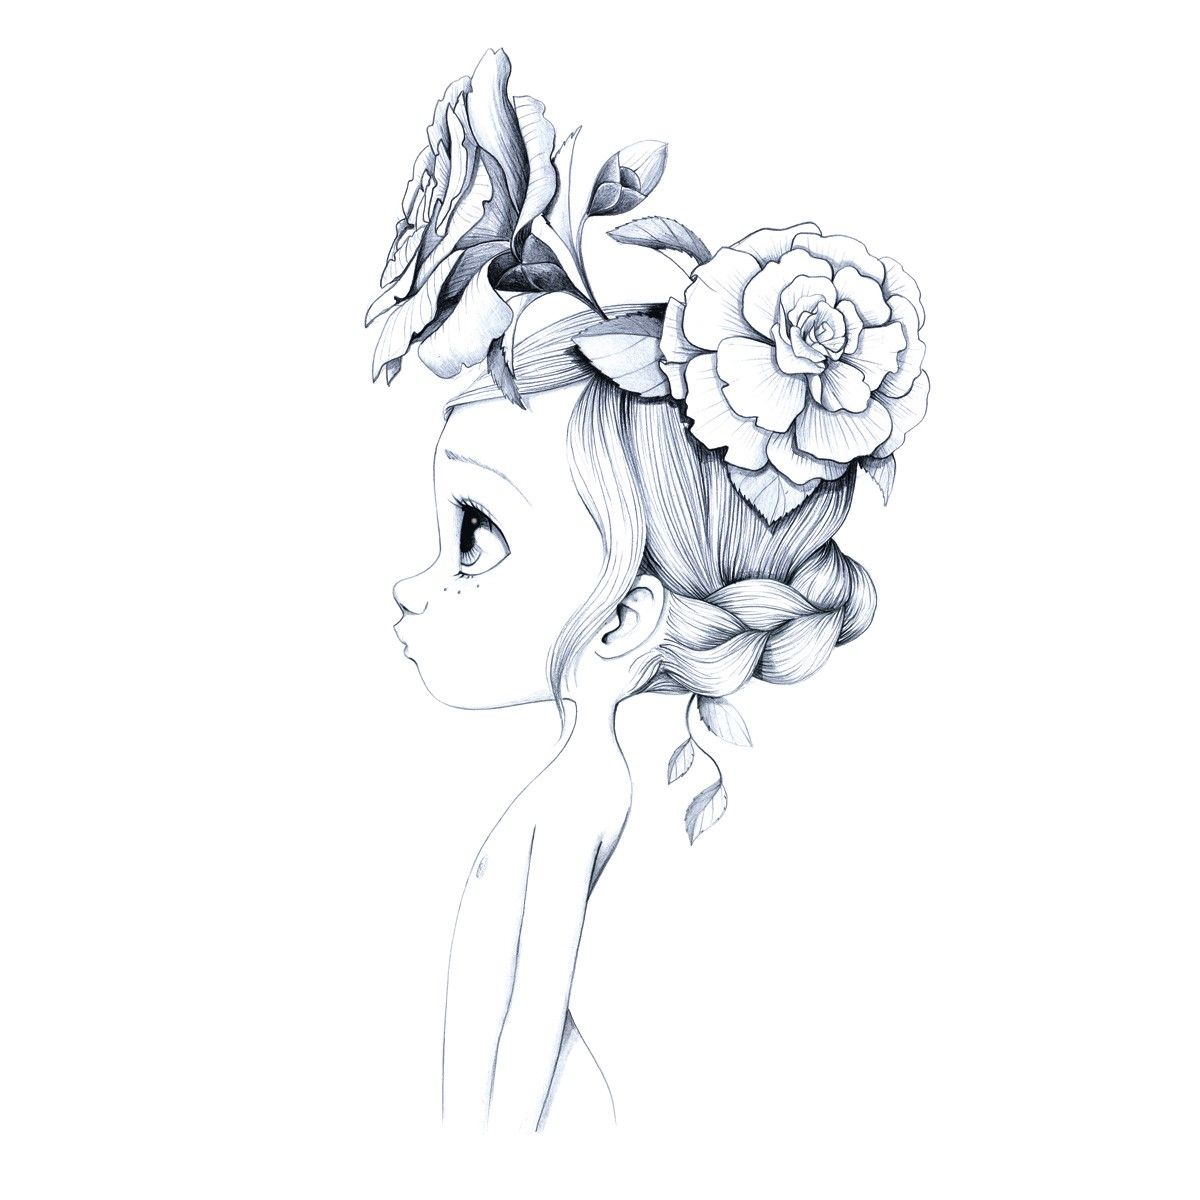 Tableau Wild Girl 01 En 2020 Fille Sauvage Dessin Art Plastique